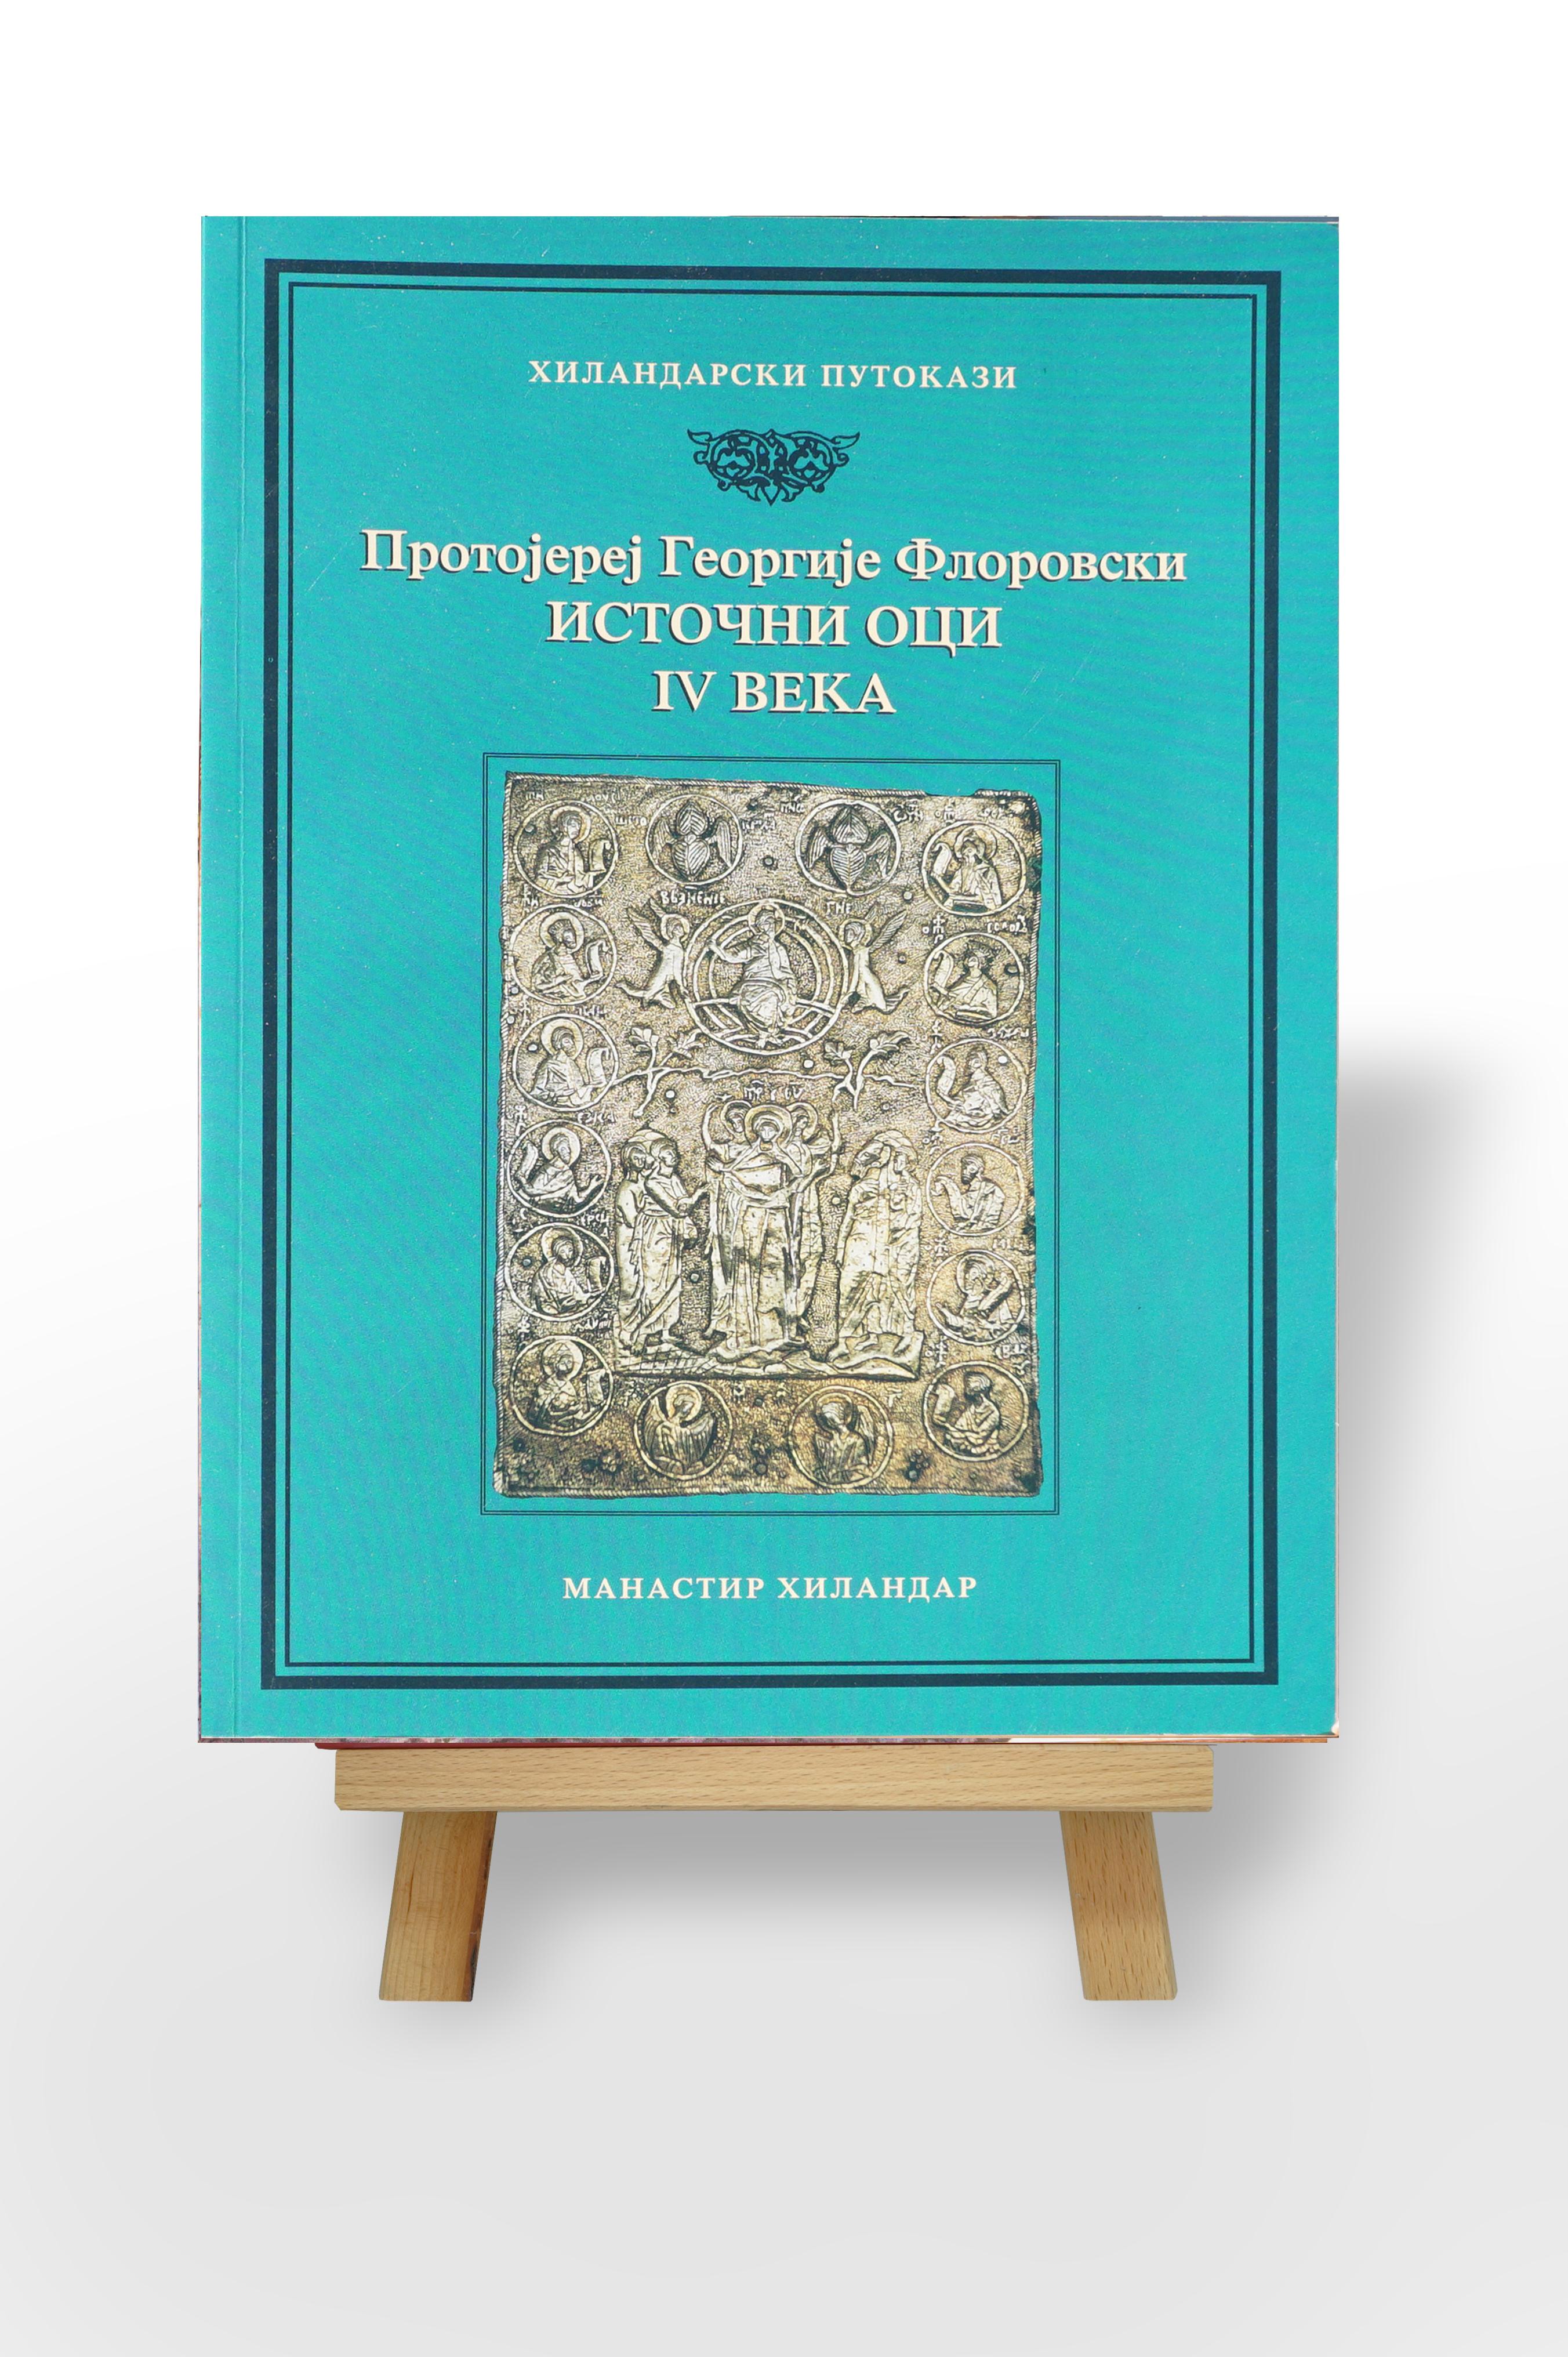 Protojerej Georgije Florovski, Istočni oci IV veka